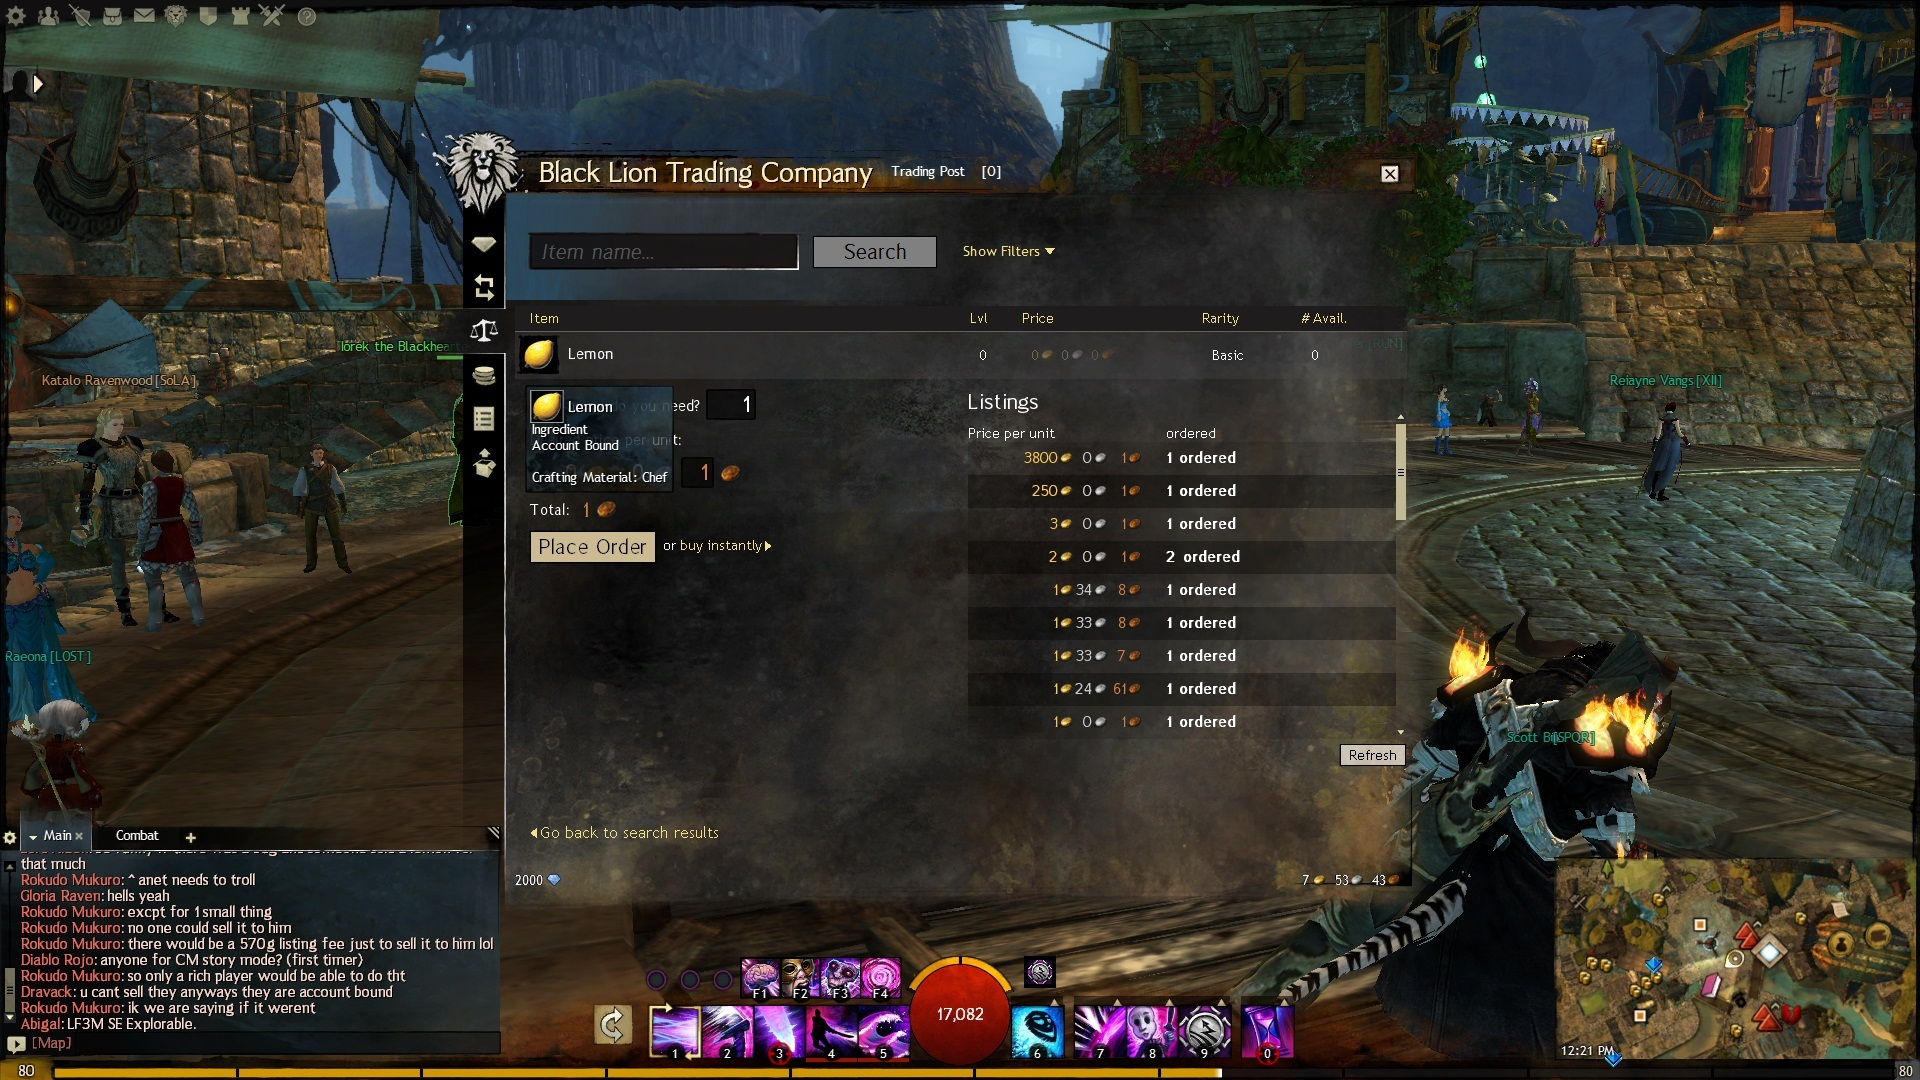 guild wars 2 forum - black lion trading co - that's a rare sight.